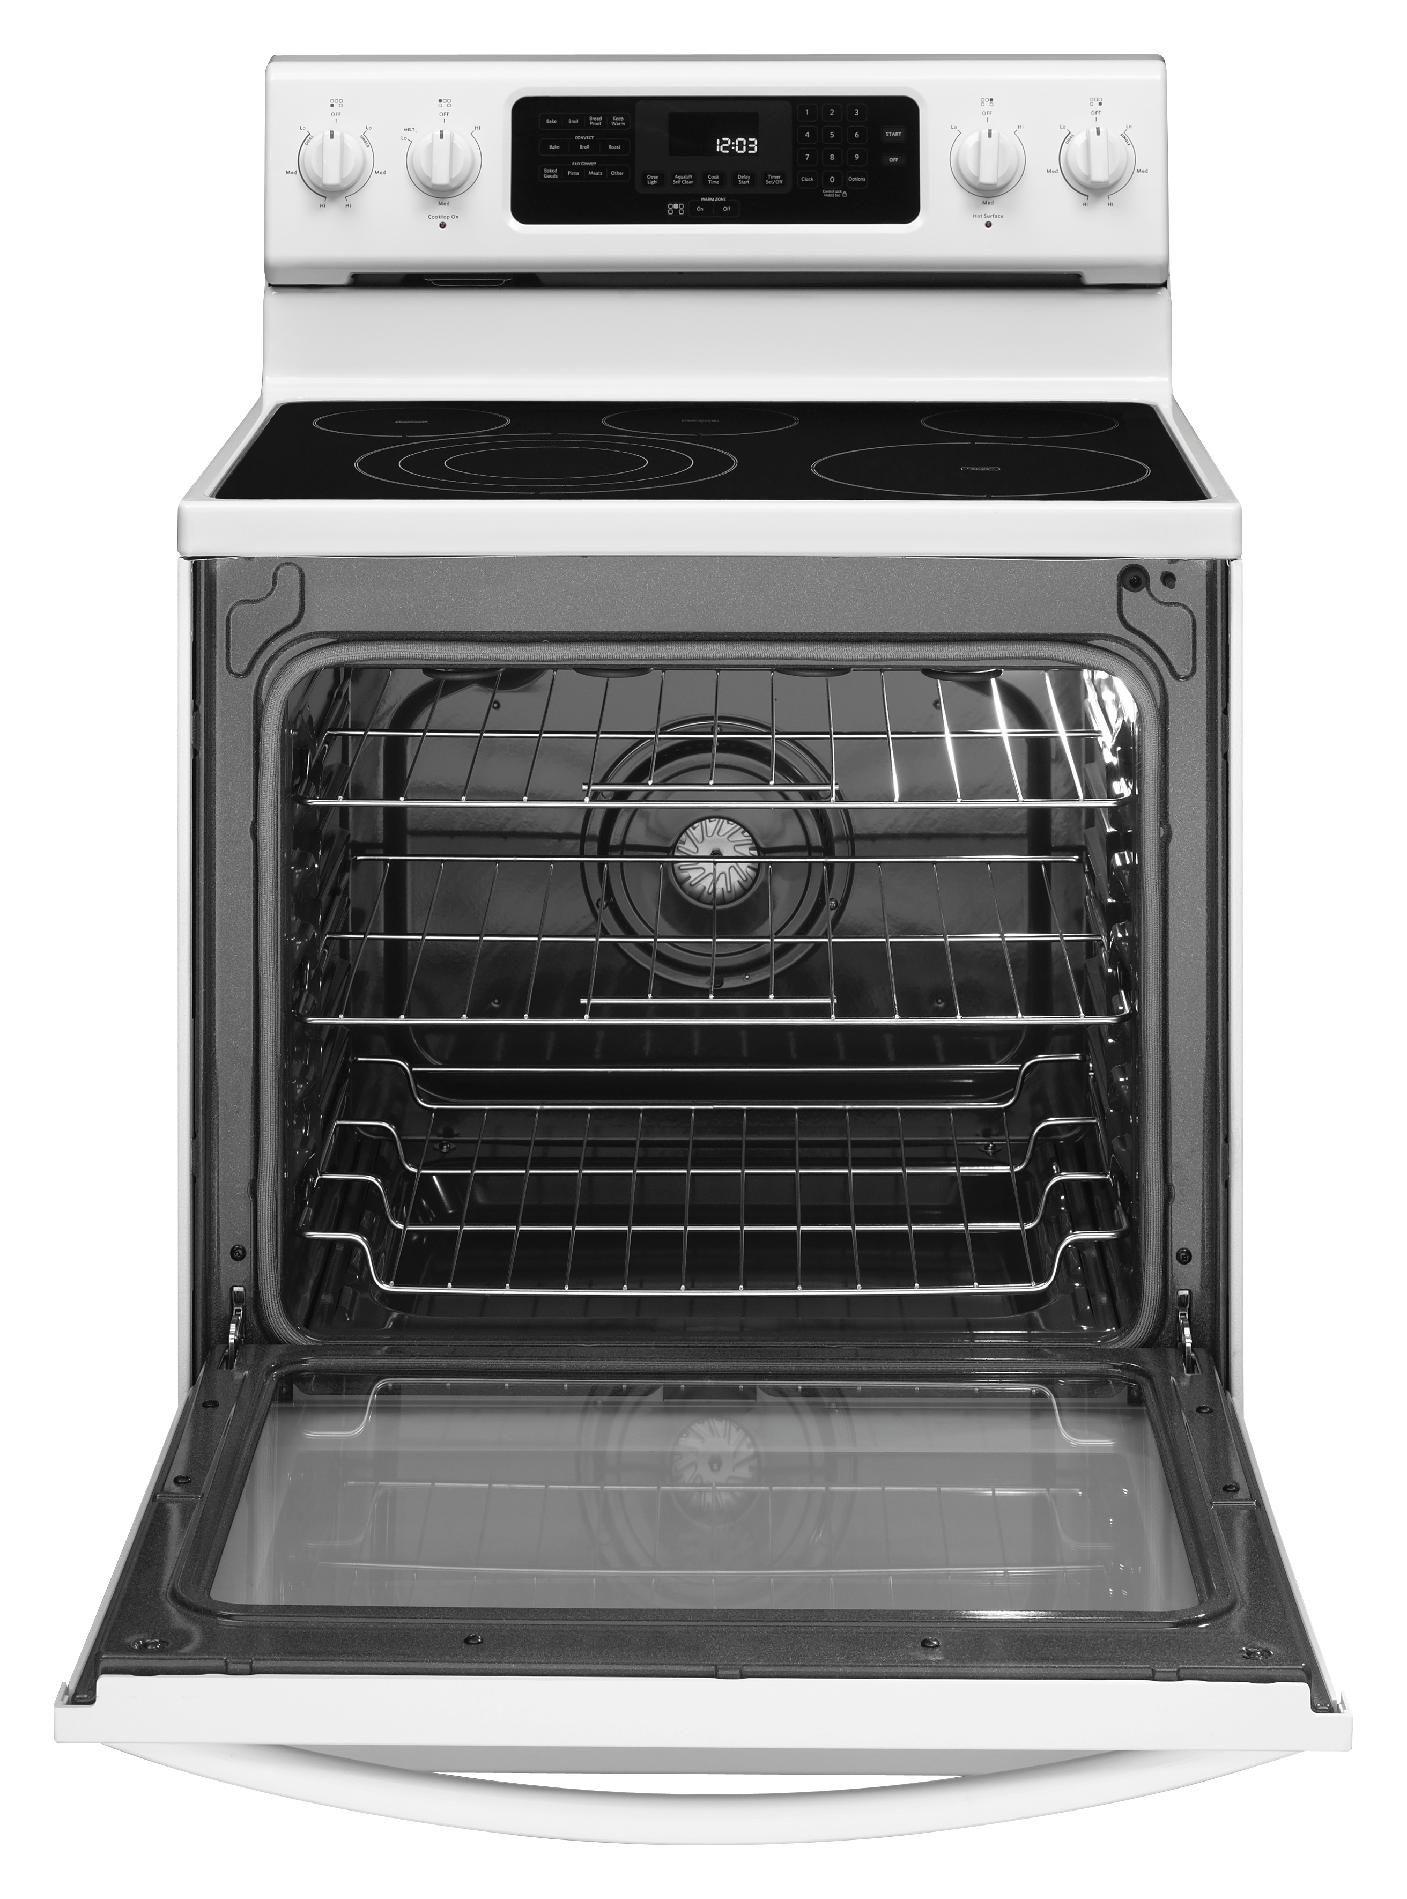 KitchenAid 6.2 cu. ft. Electric Range w/ Event-Heat™ Technology - White